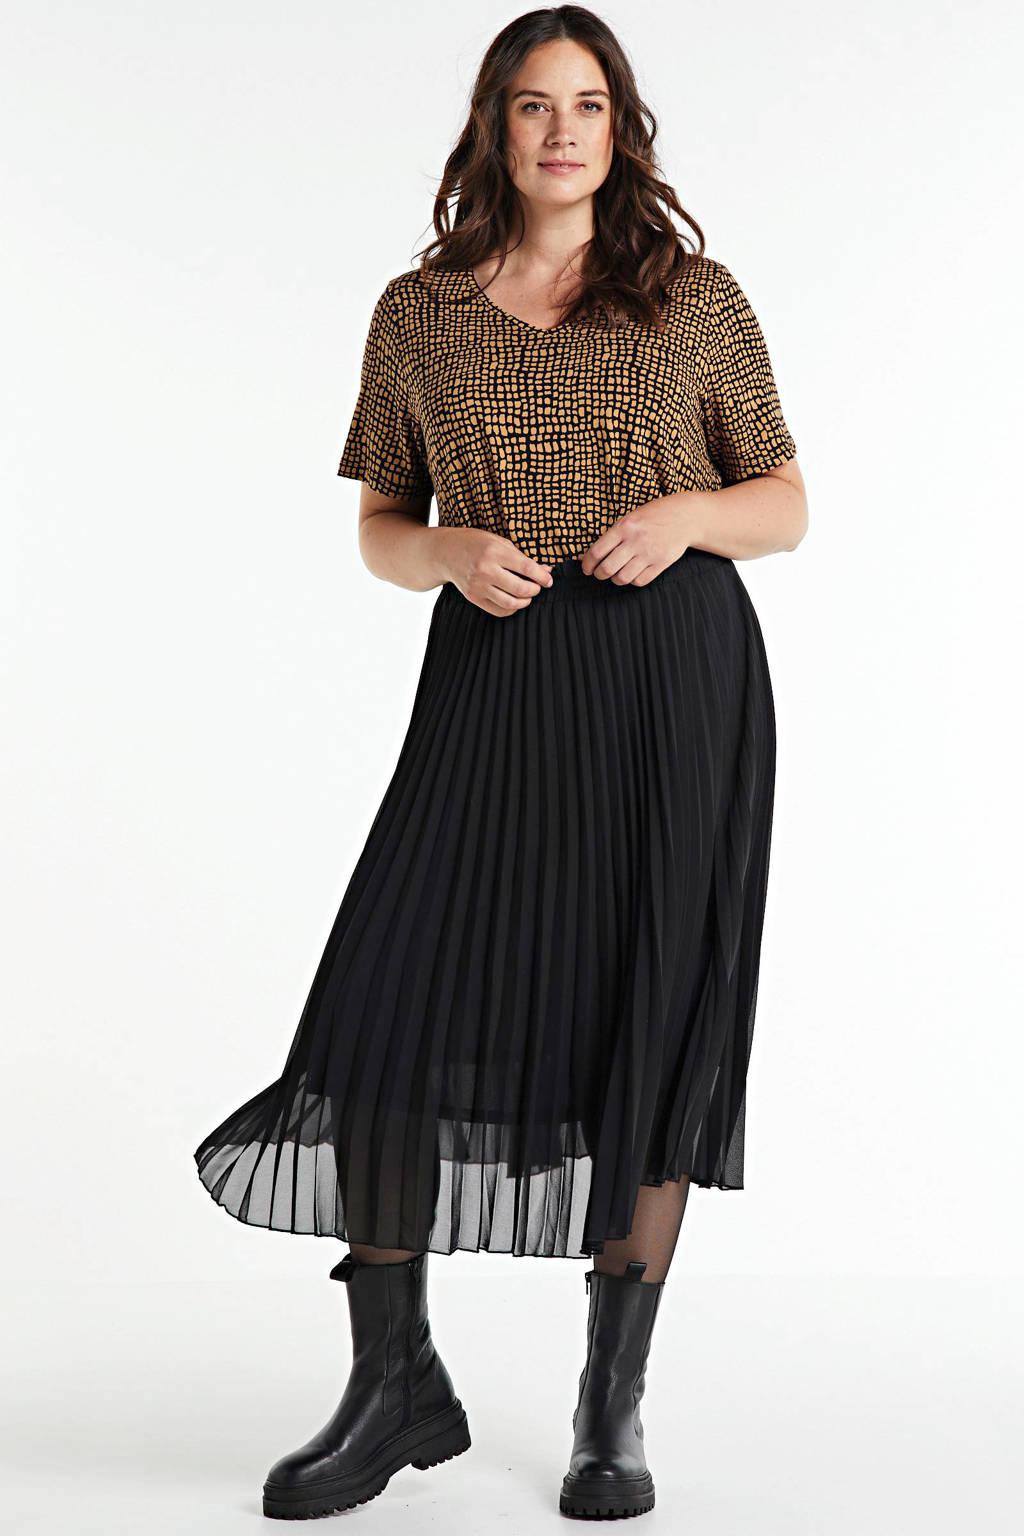 Yesta T-shirt Alba Essential met all over print zwart/camel, Zwart/camel